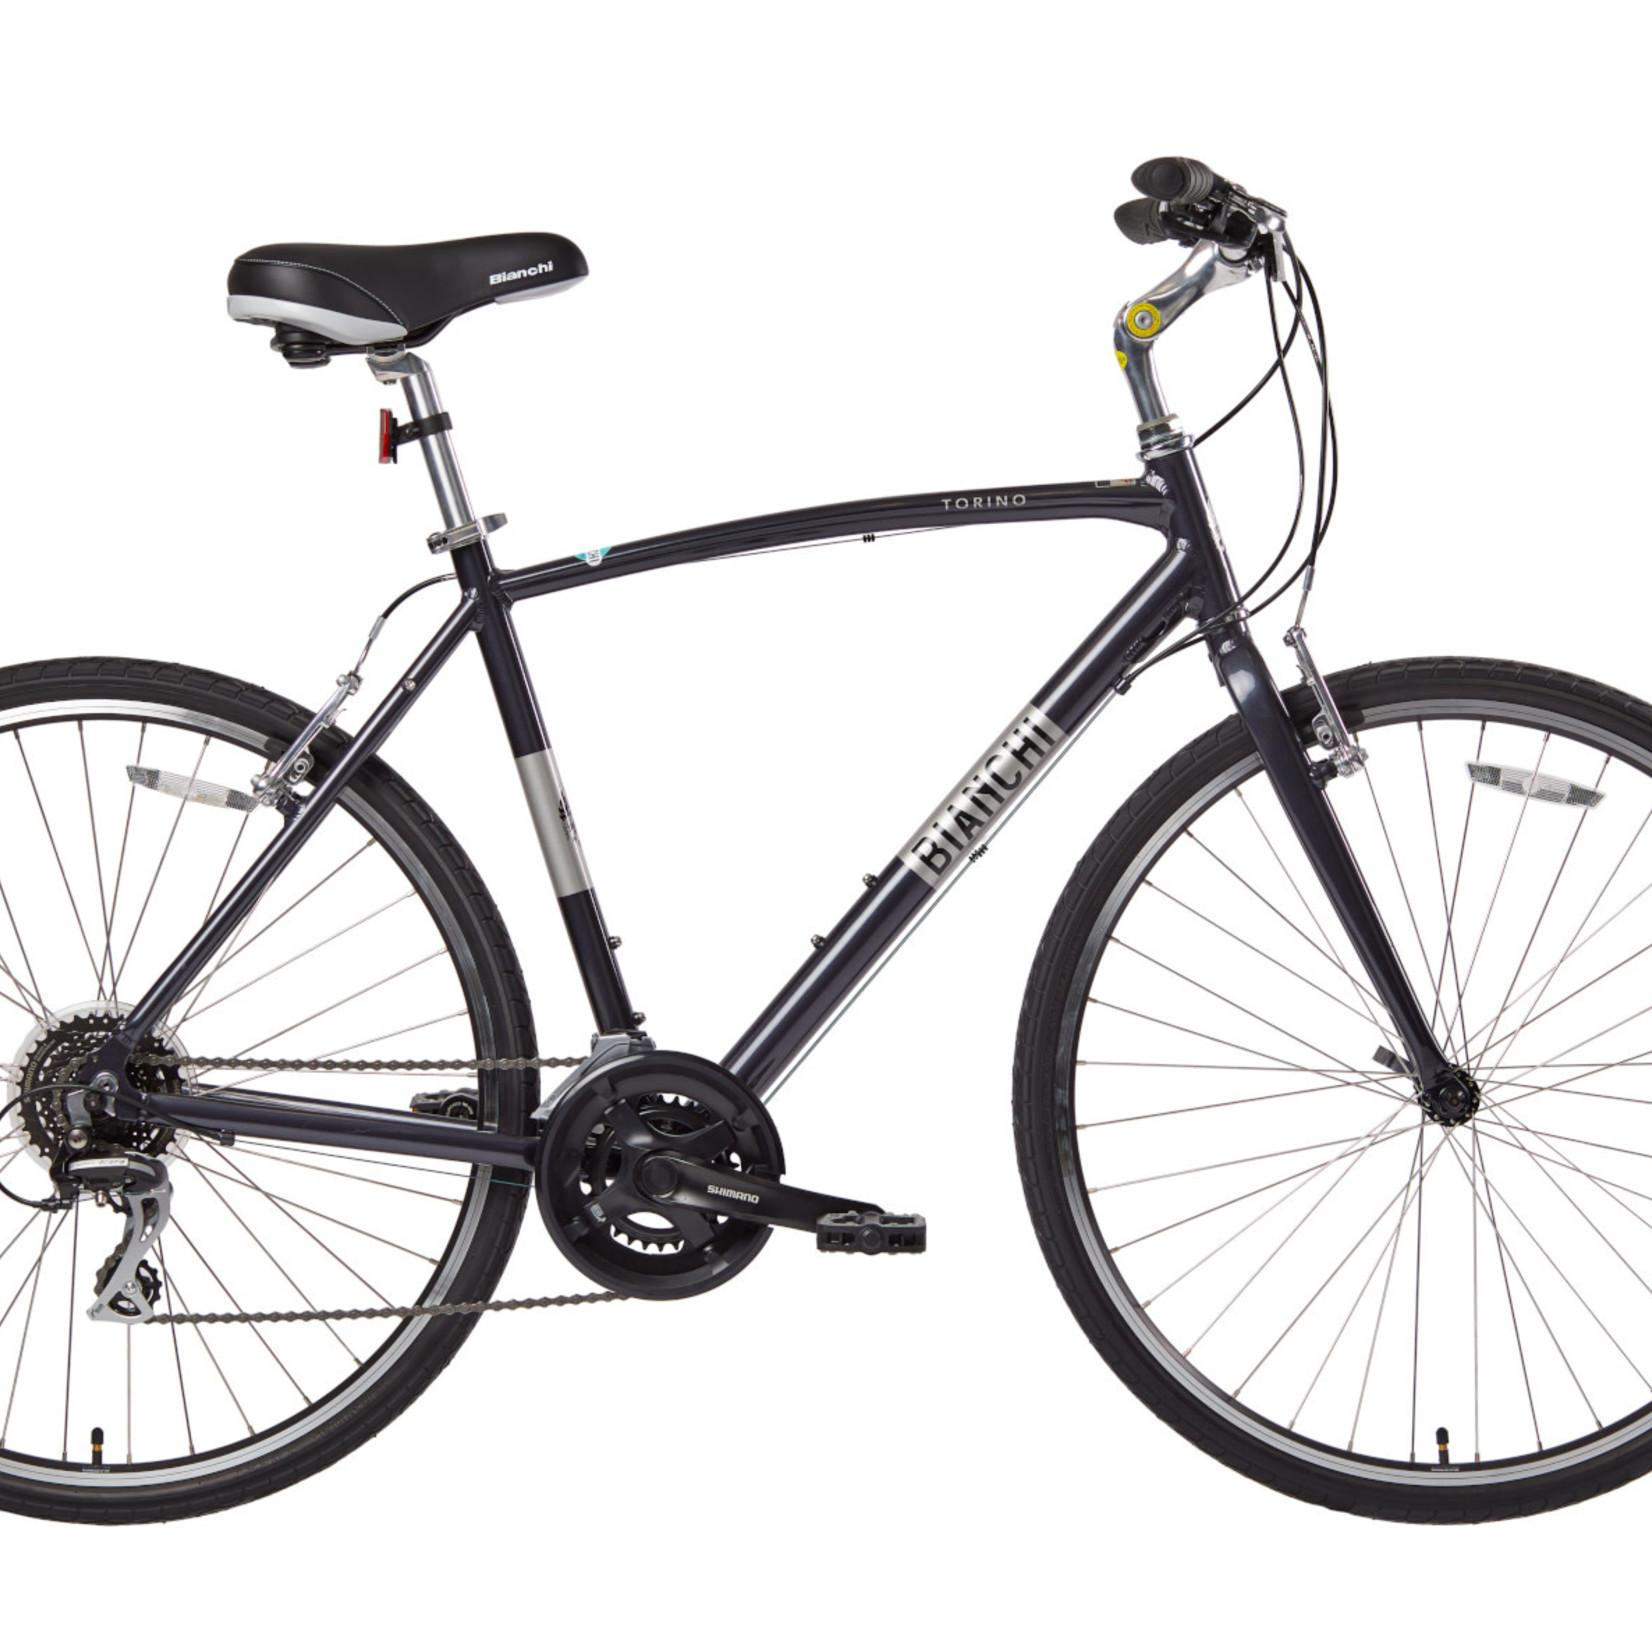 Bianchi Bikes - Bianchi Cortina - 54cm